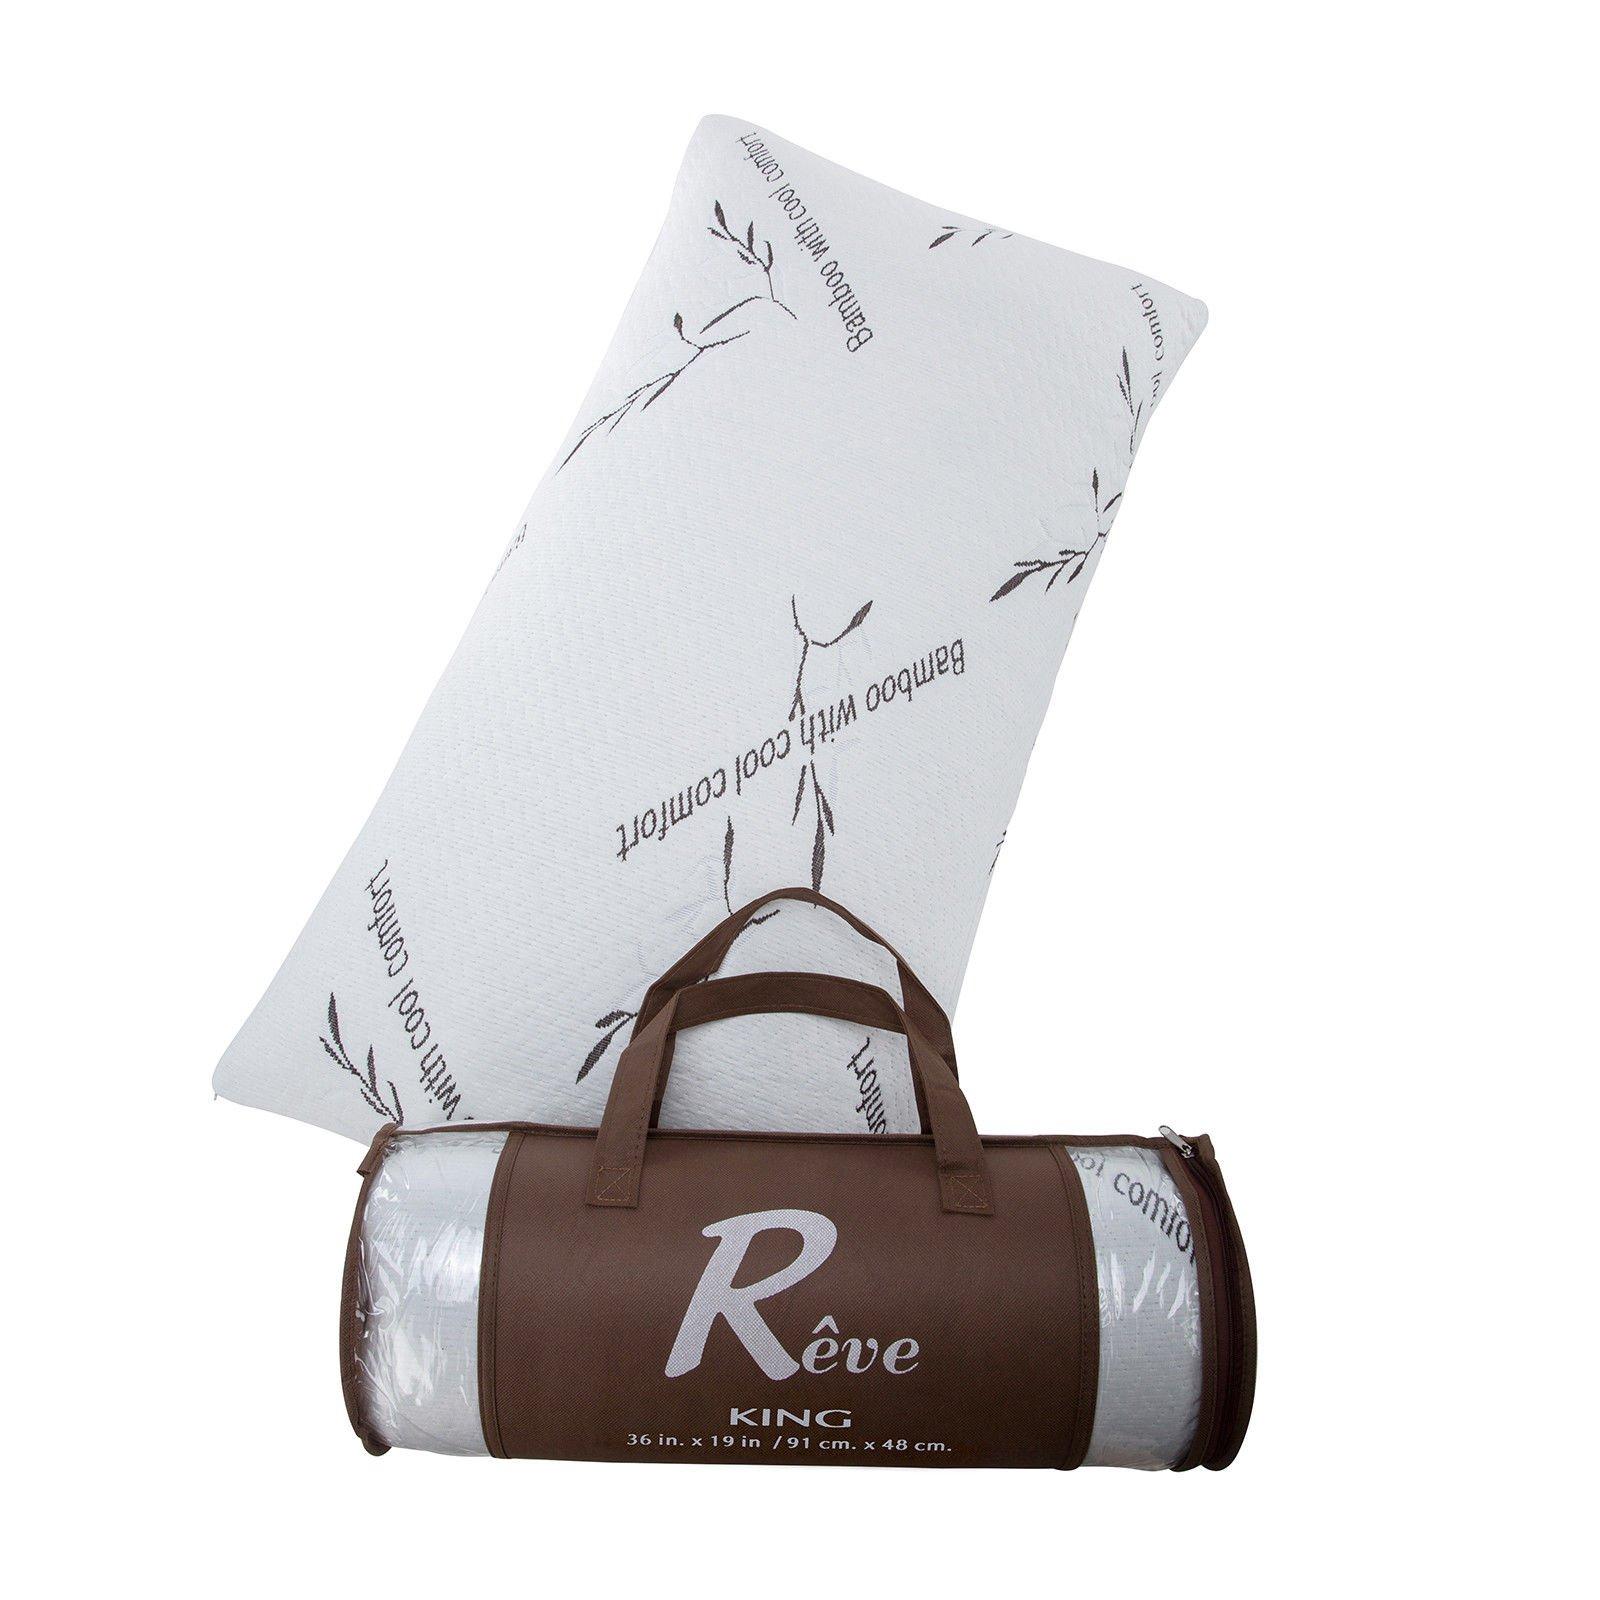 2 PACK Queen Hotel Bamboo Pillow Memory Foam Hypoallergenic Cool Comfort NEW